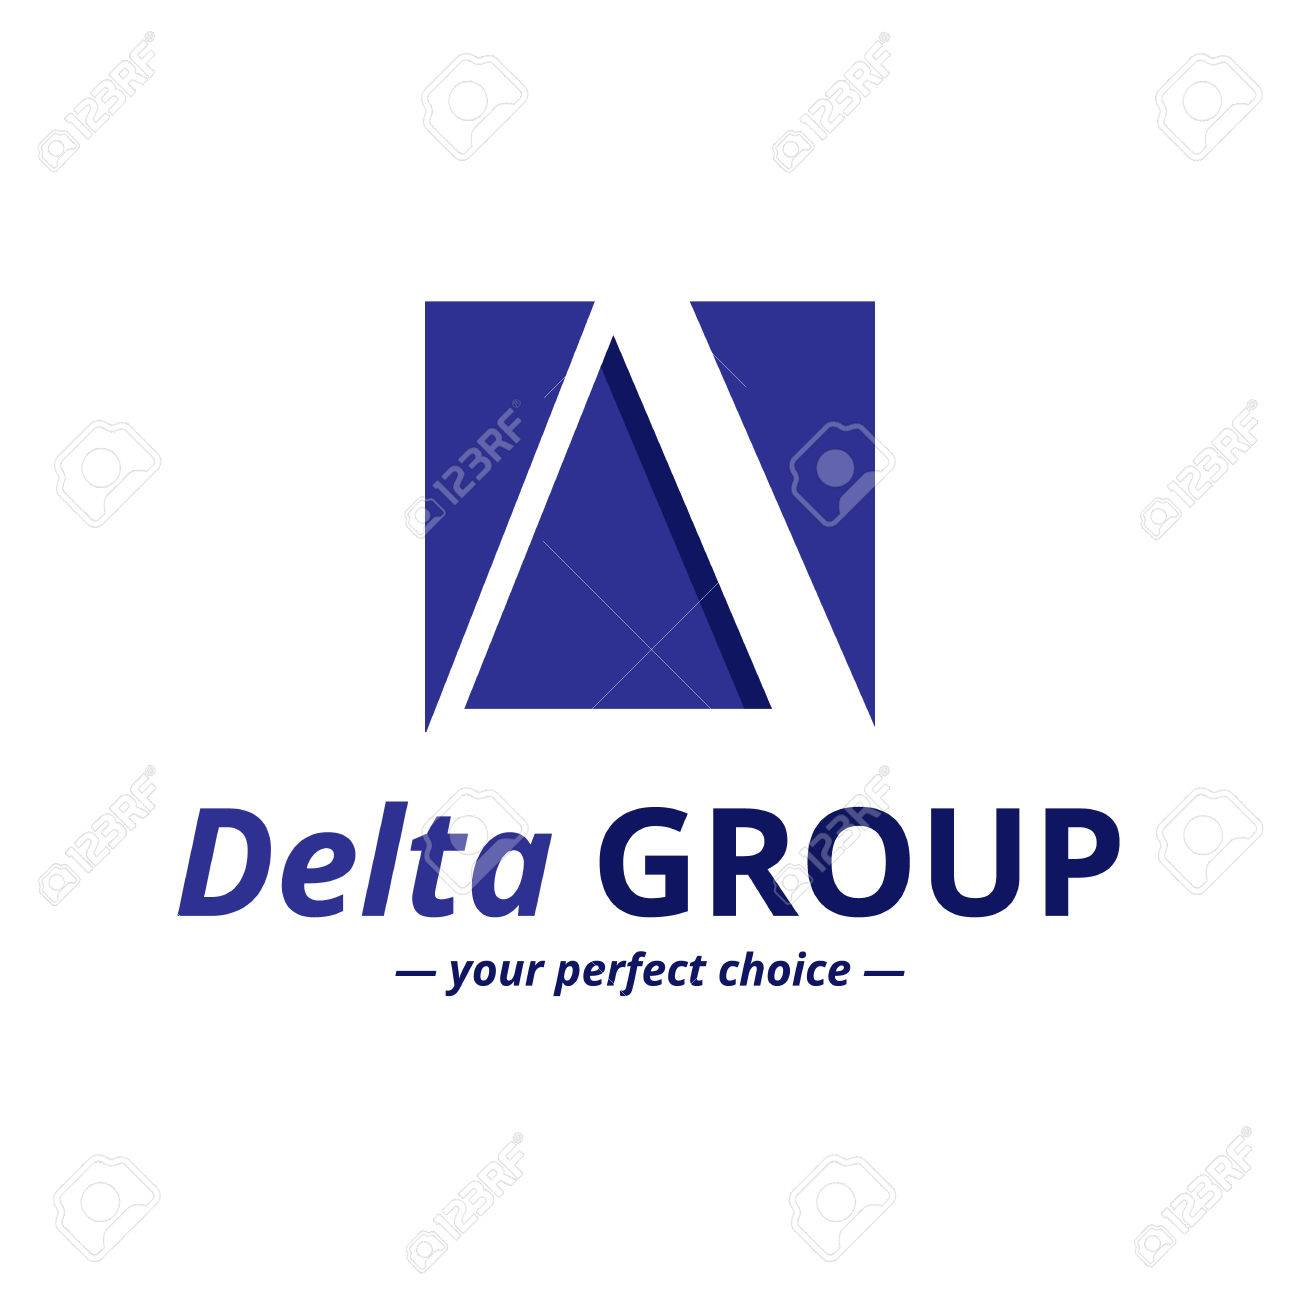 Vector minimalistic negative space greek letter logo delta letter vector minimalistic negative space greek letter logo delta letter symbol stock vector 55495532 biocorpaavc Choice Image